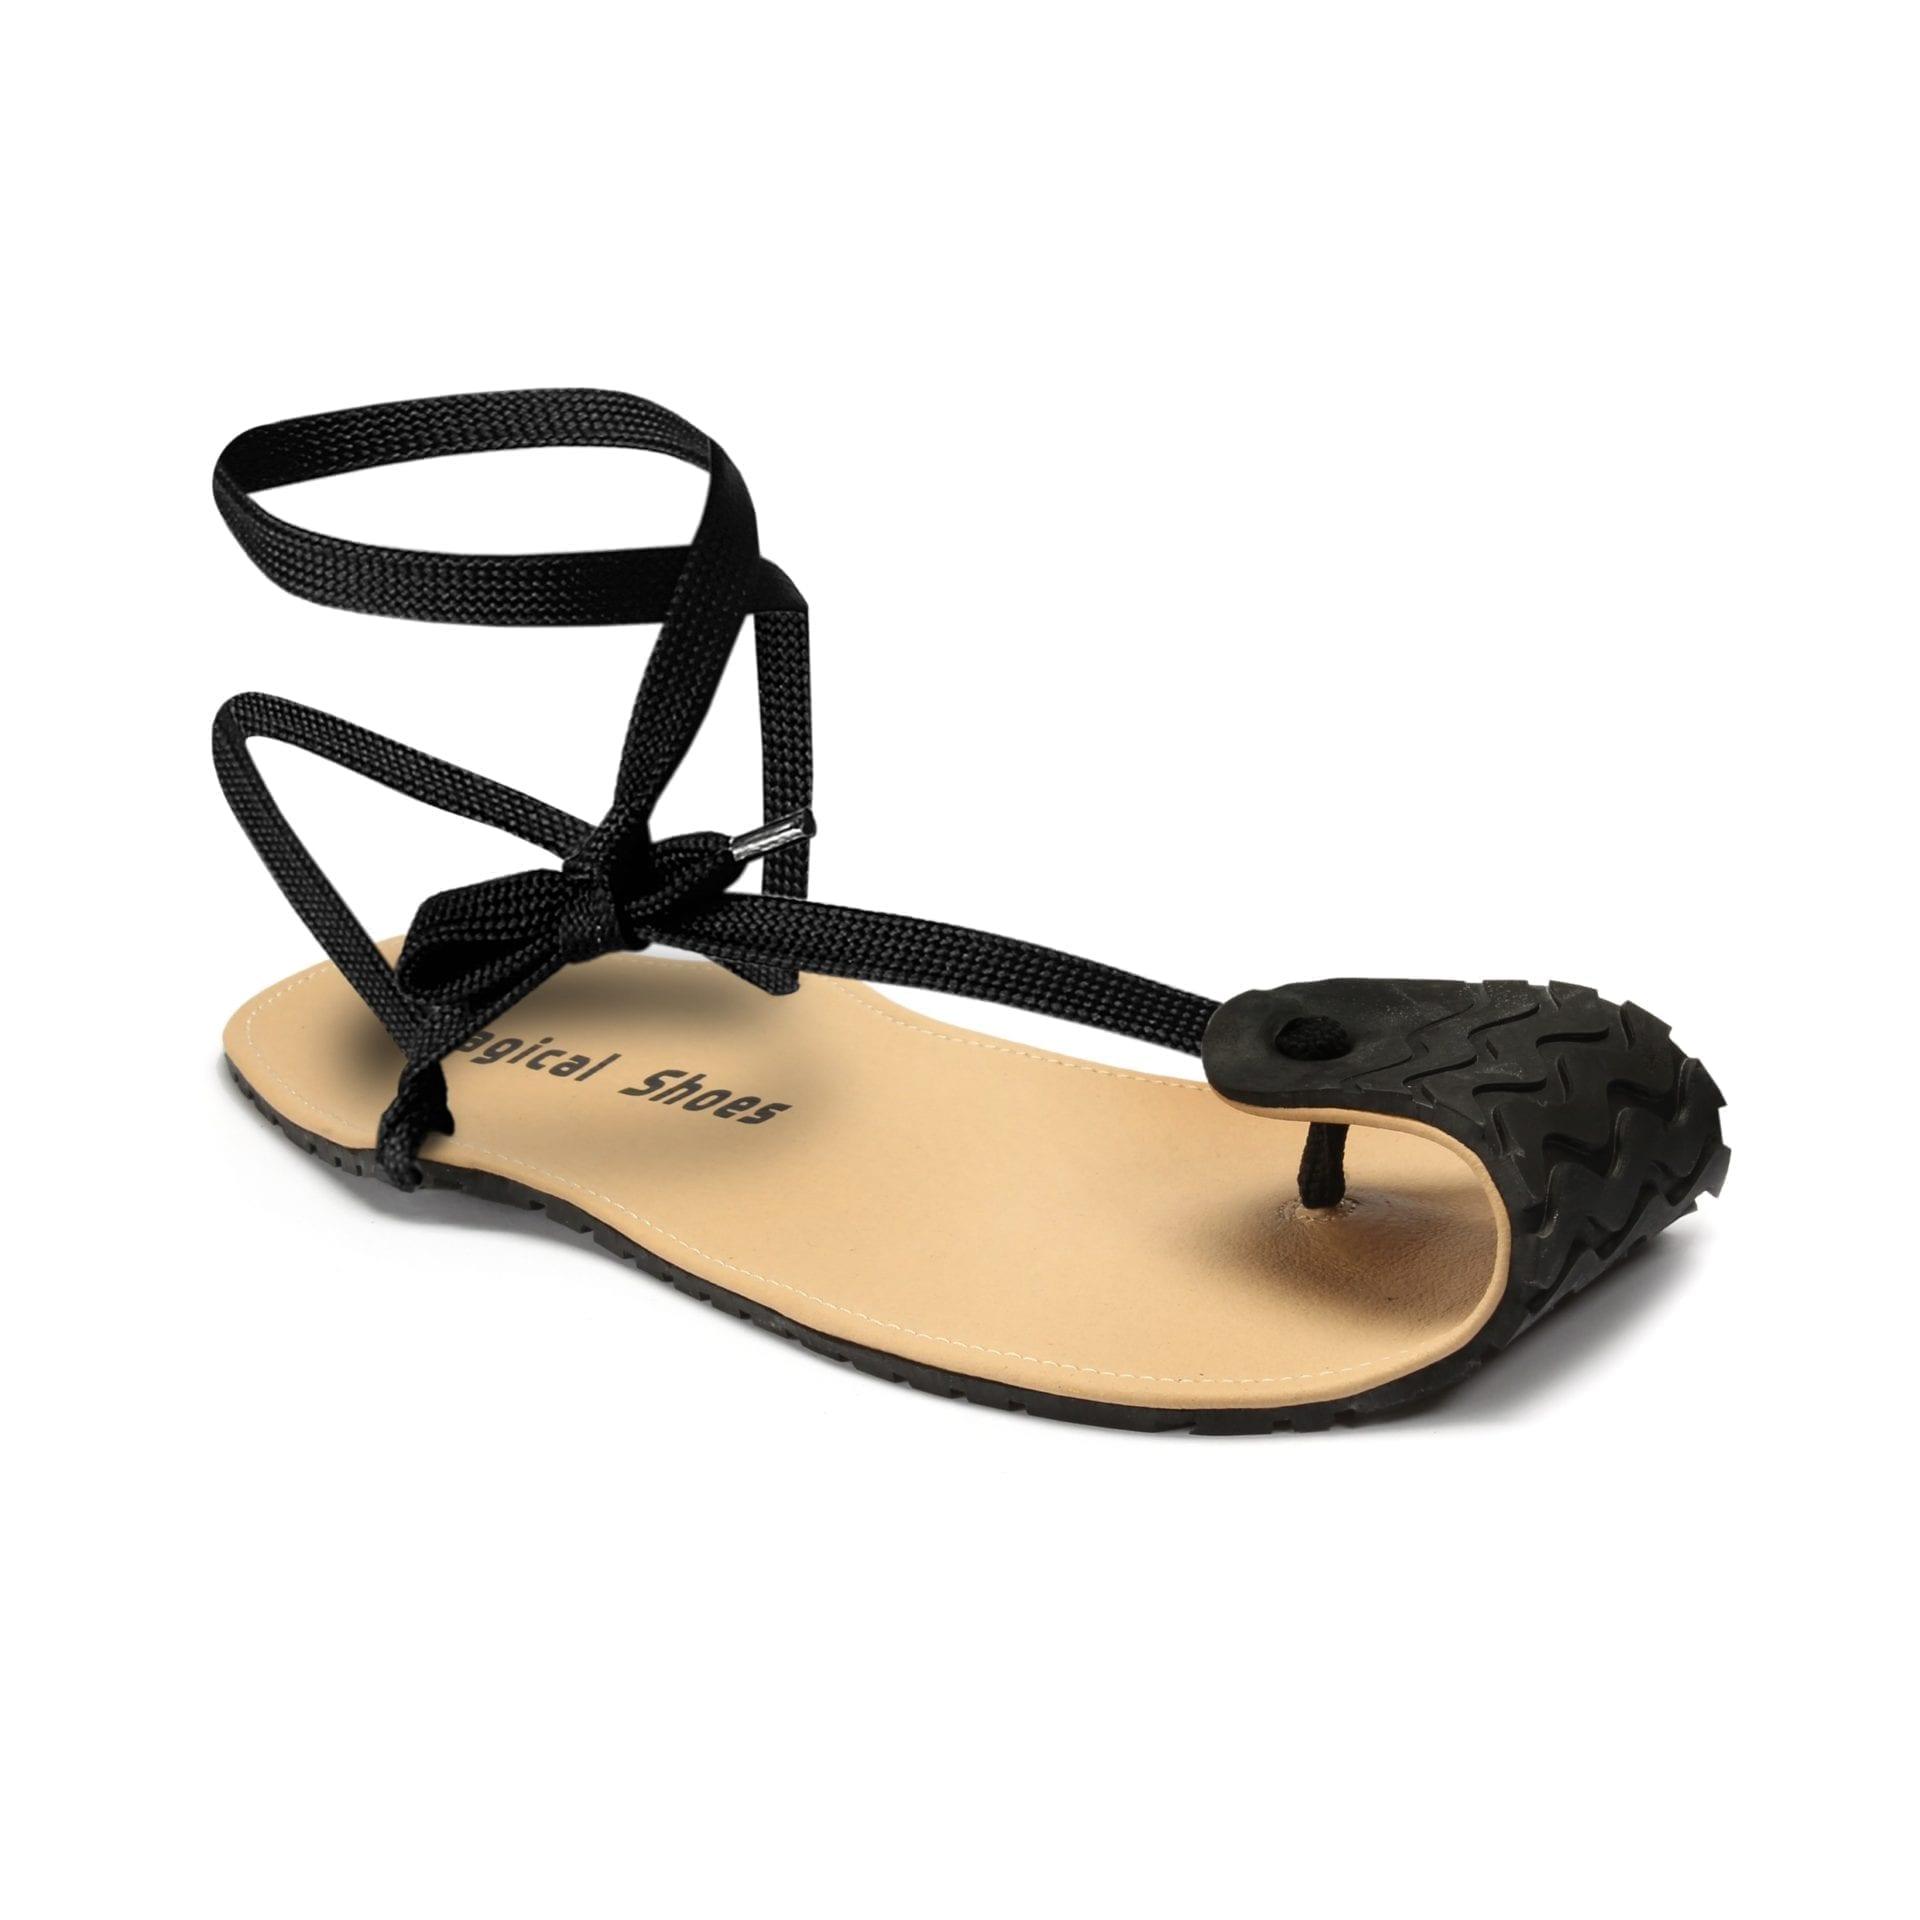 26973113 tarahumara flip-flops men's sandals barefoot born to run